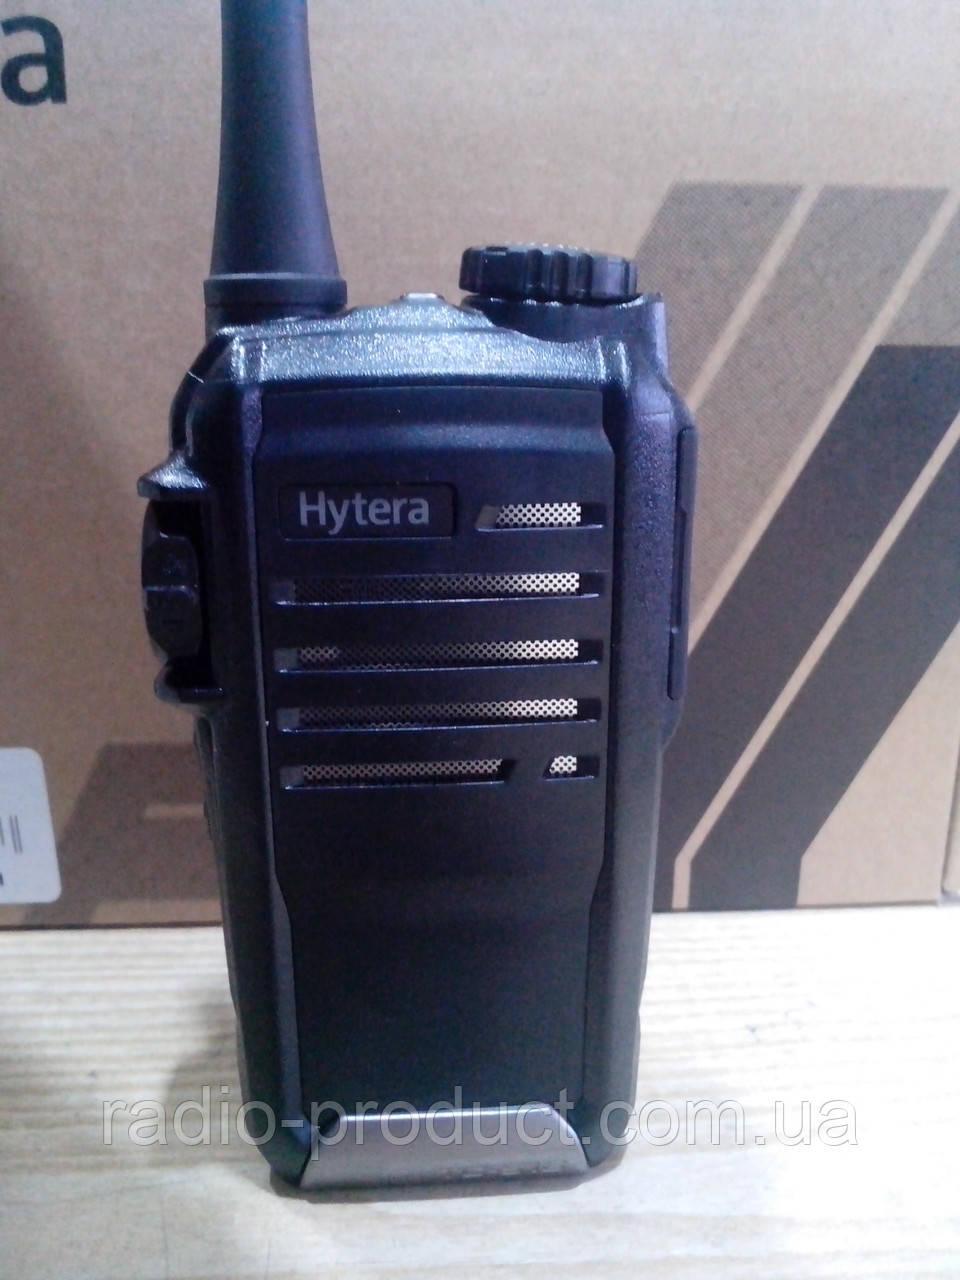 Hytera TC-518 UHF, рация, радиостанция, скремблер